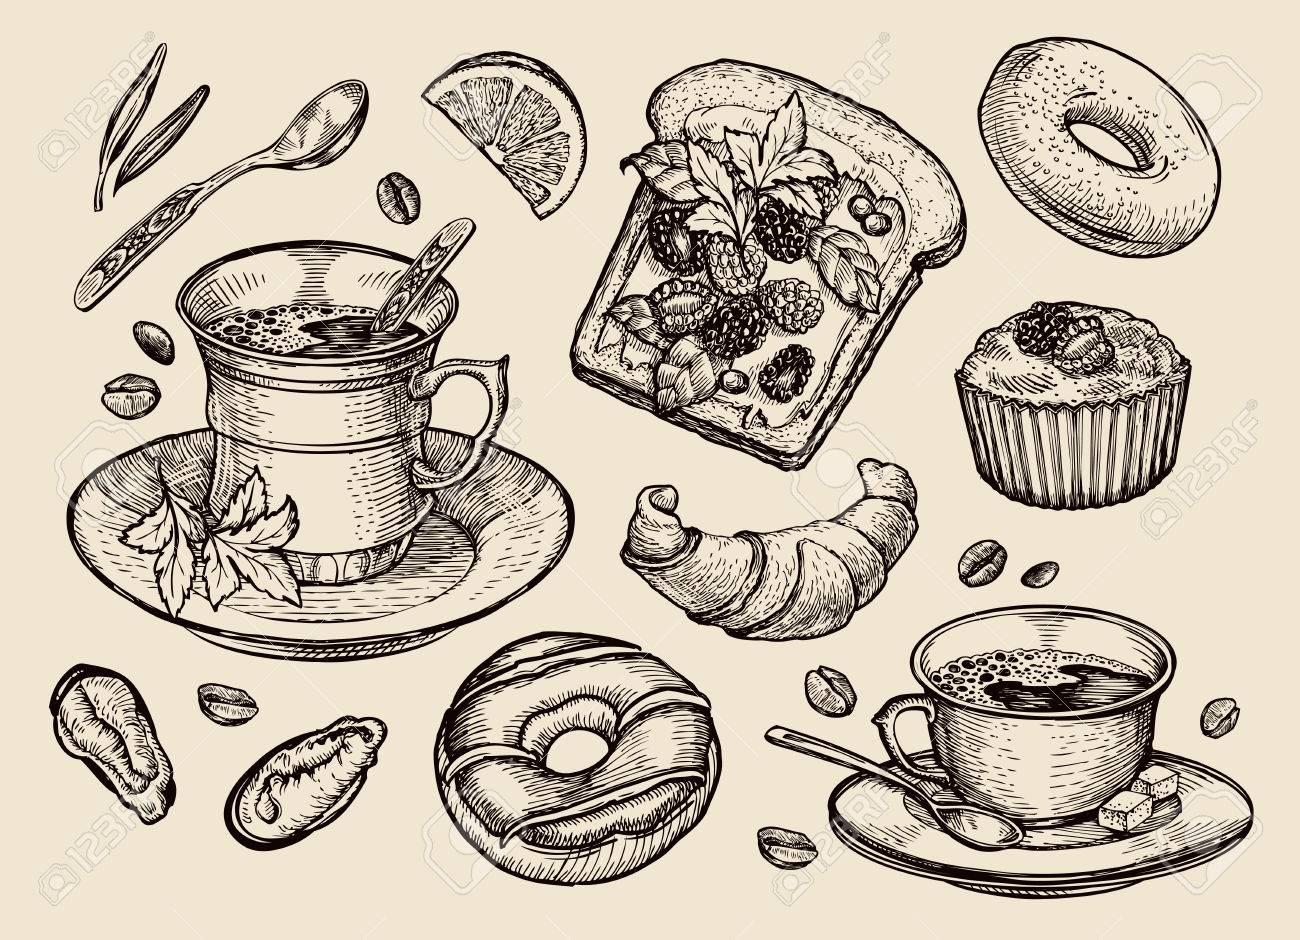 food vector sketch sandwich dessert coffee cup tea royalty free cliparts vectors and stock illustration image 55349061 food vector sketch sandwich dessert coffee cup tea